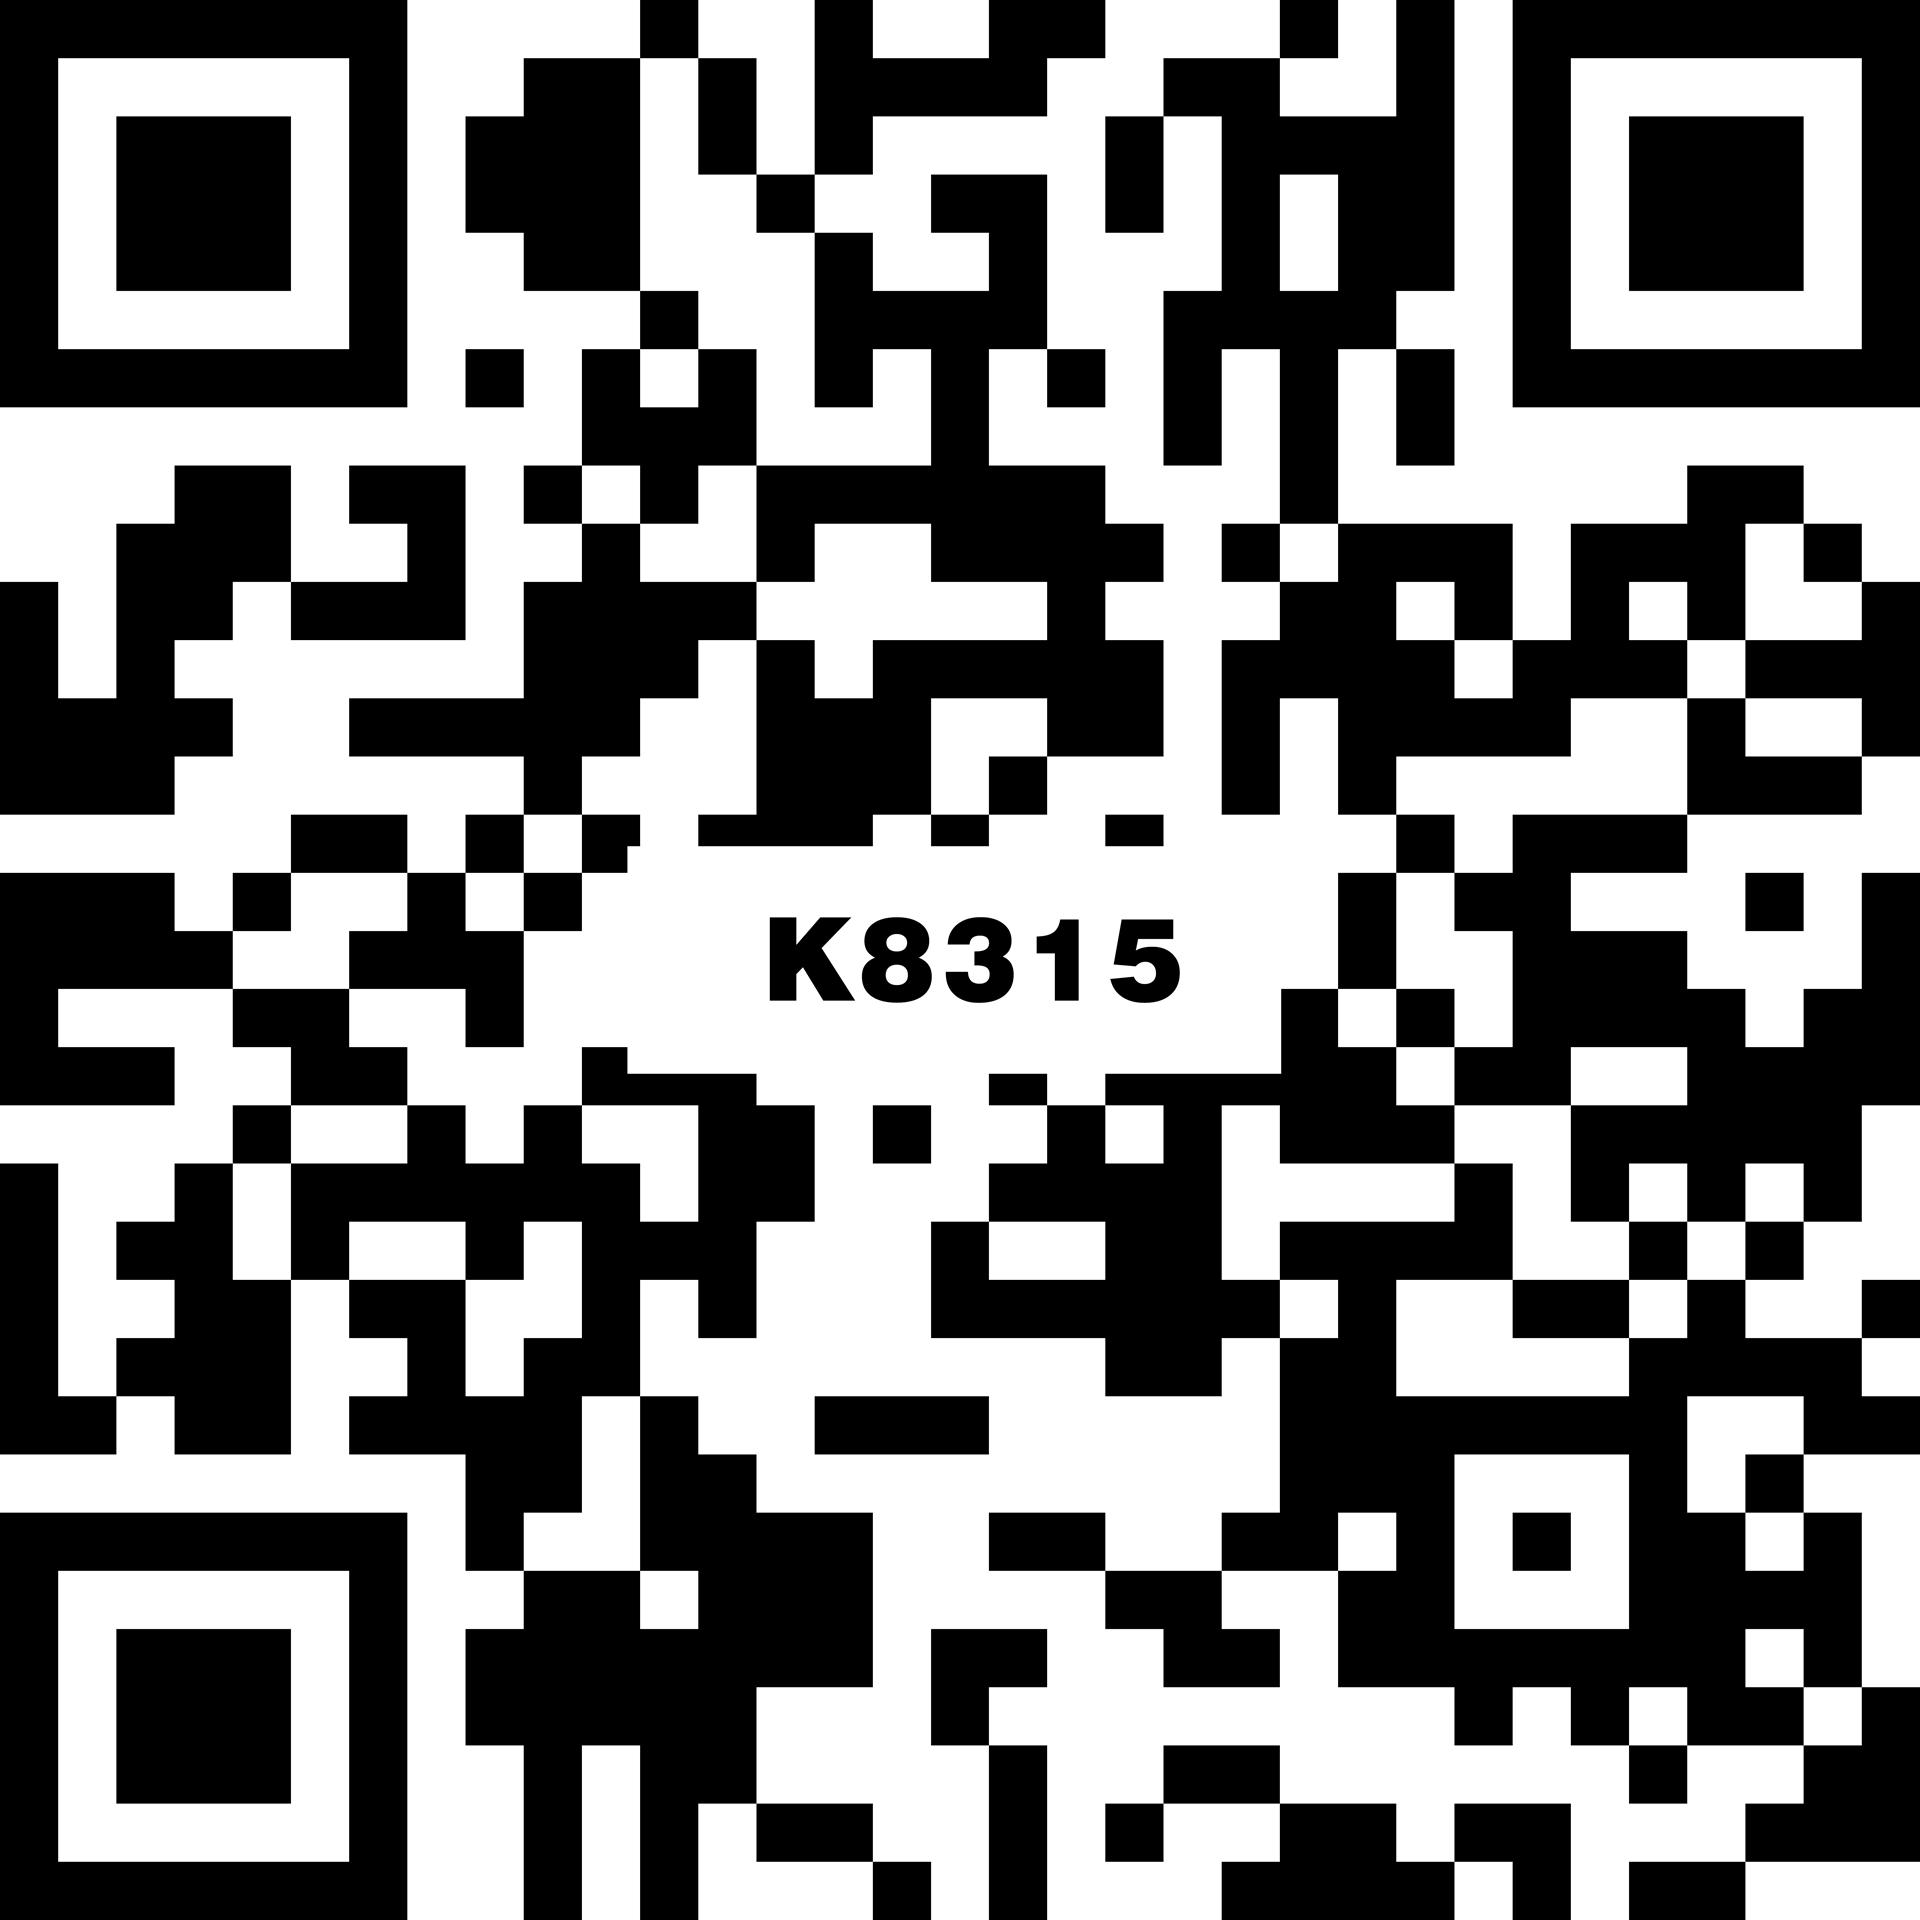 K8315